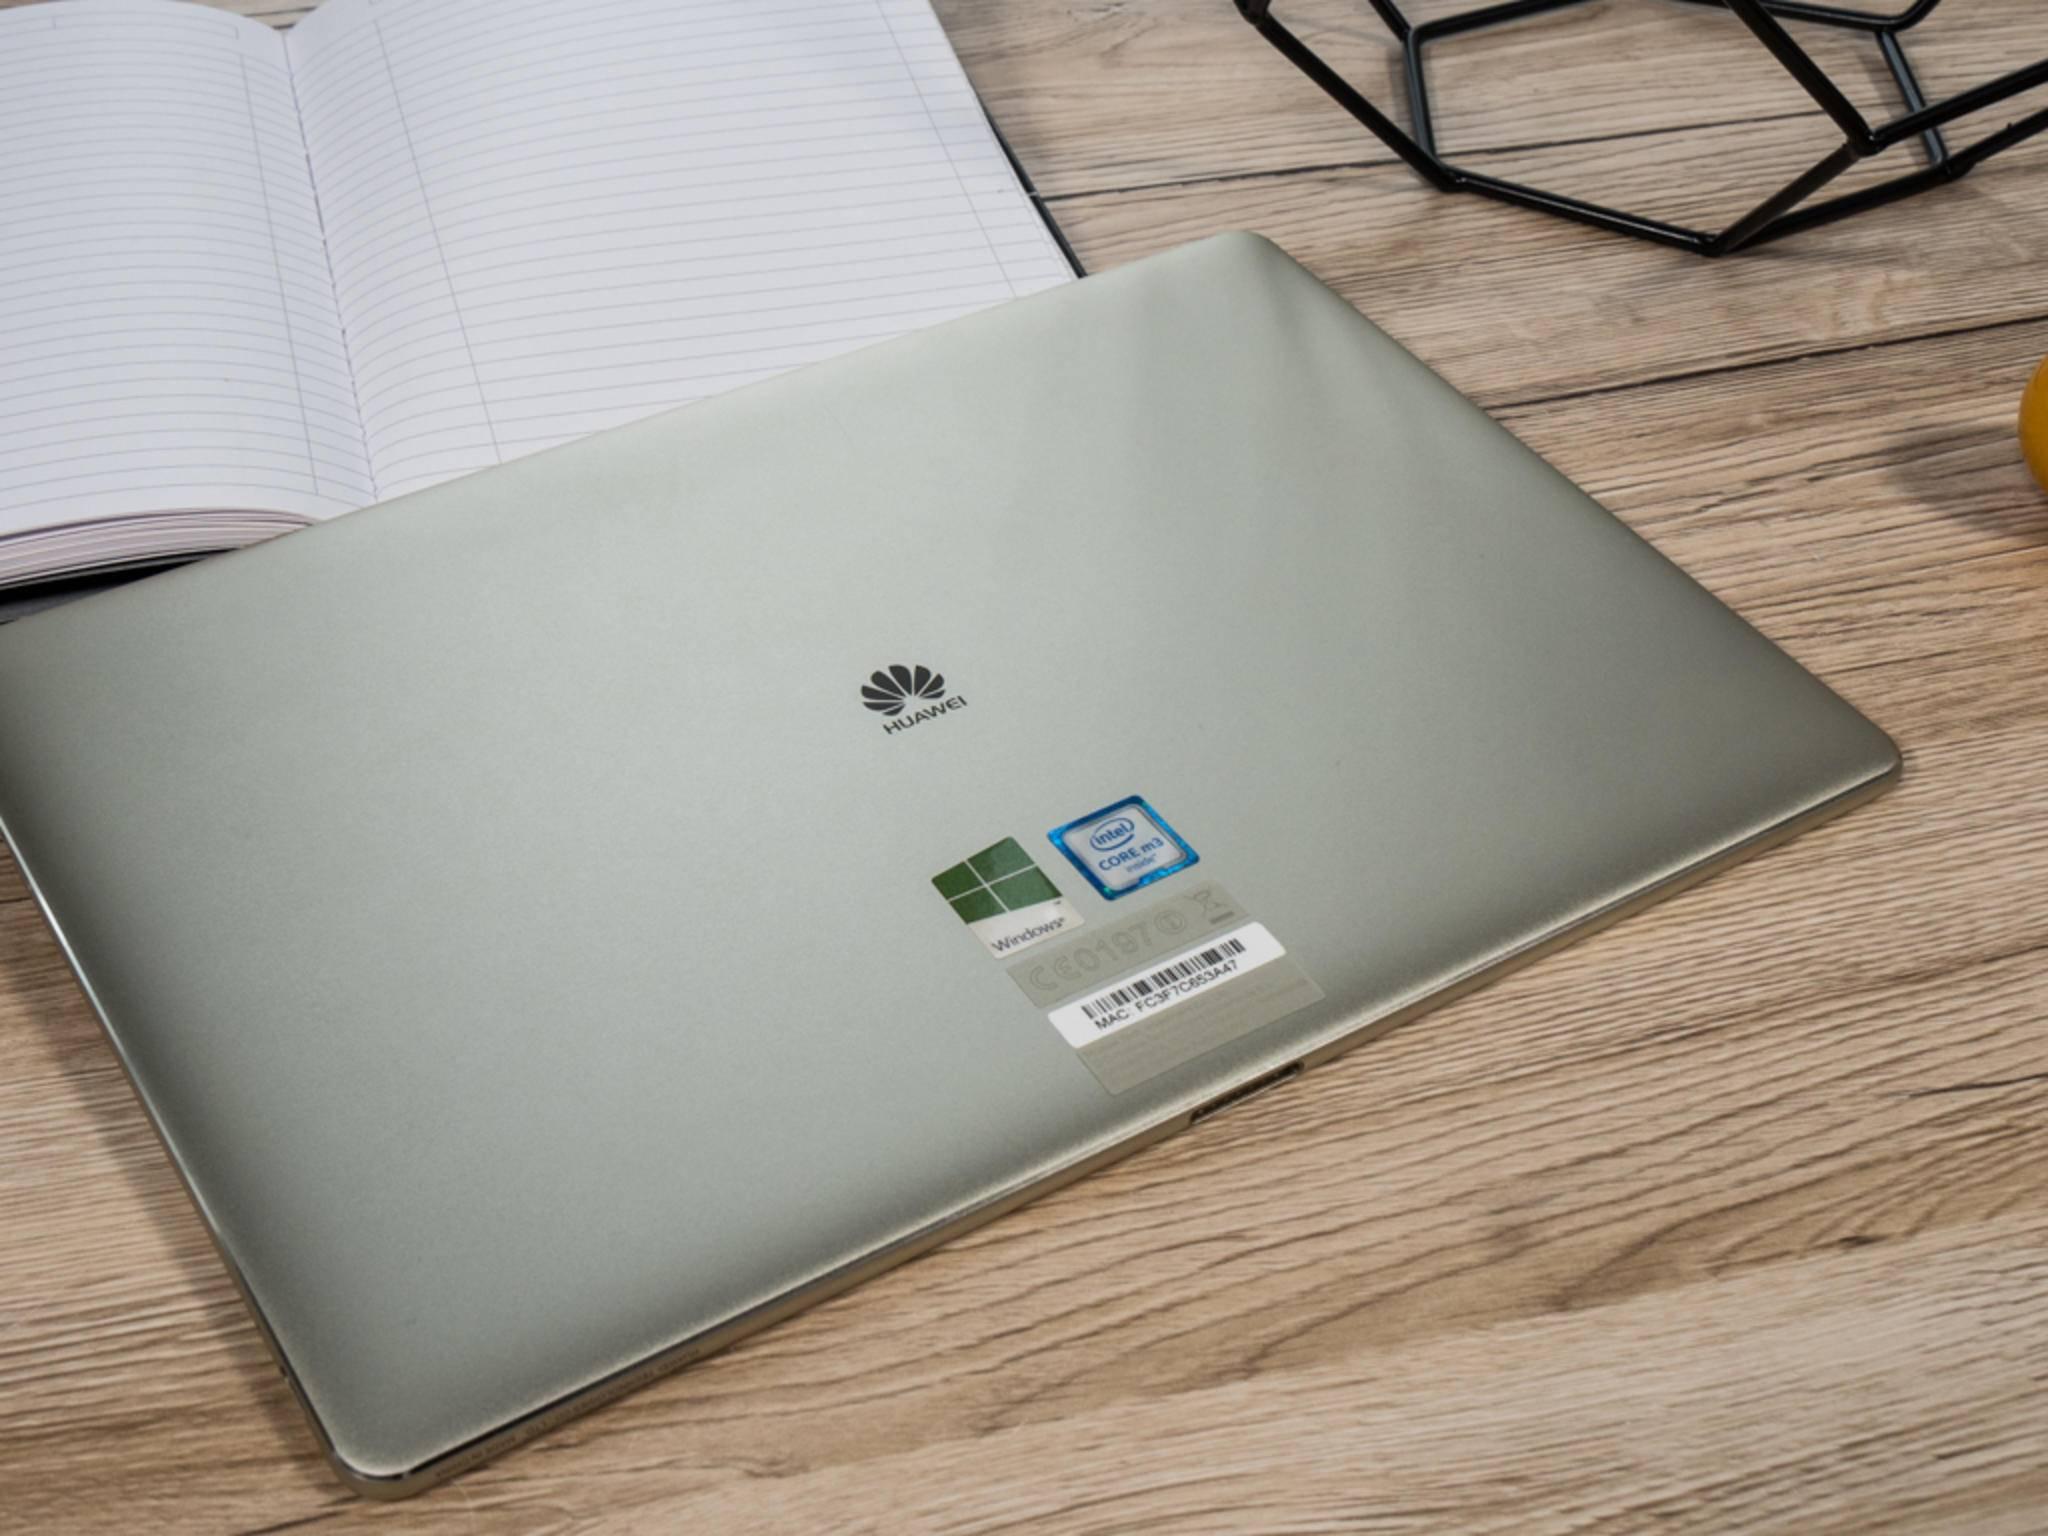 Huawei MateBook 4